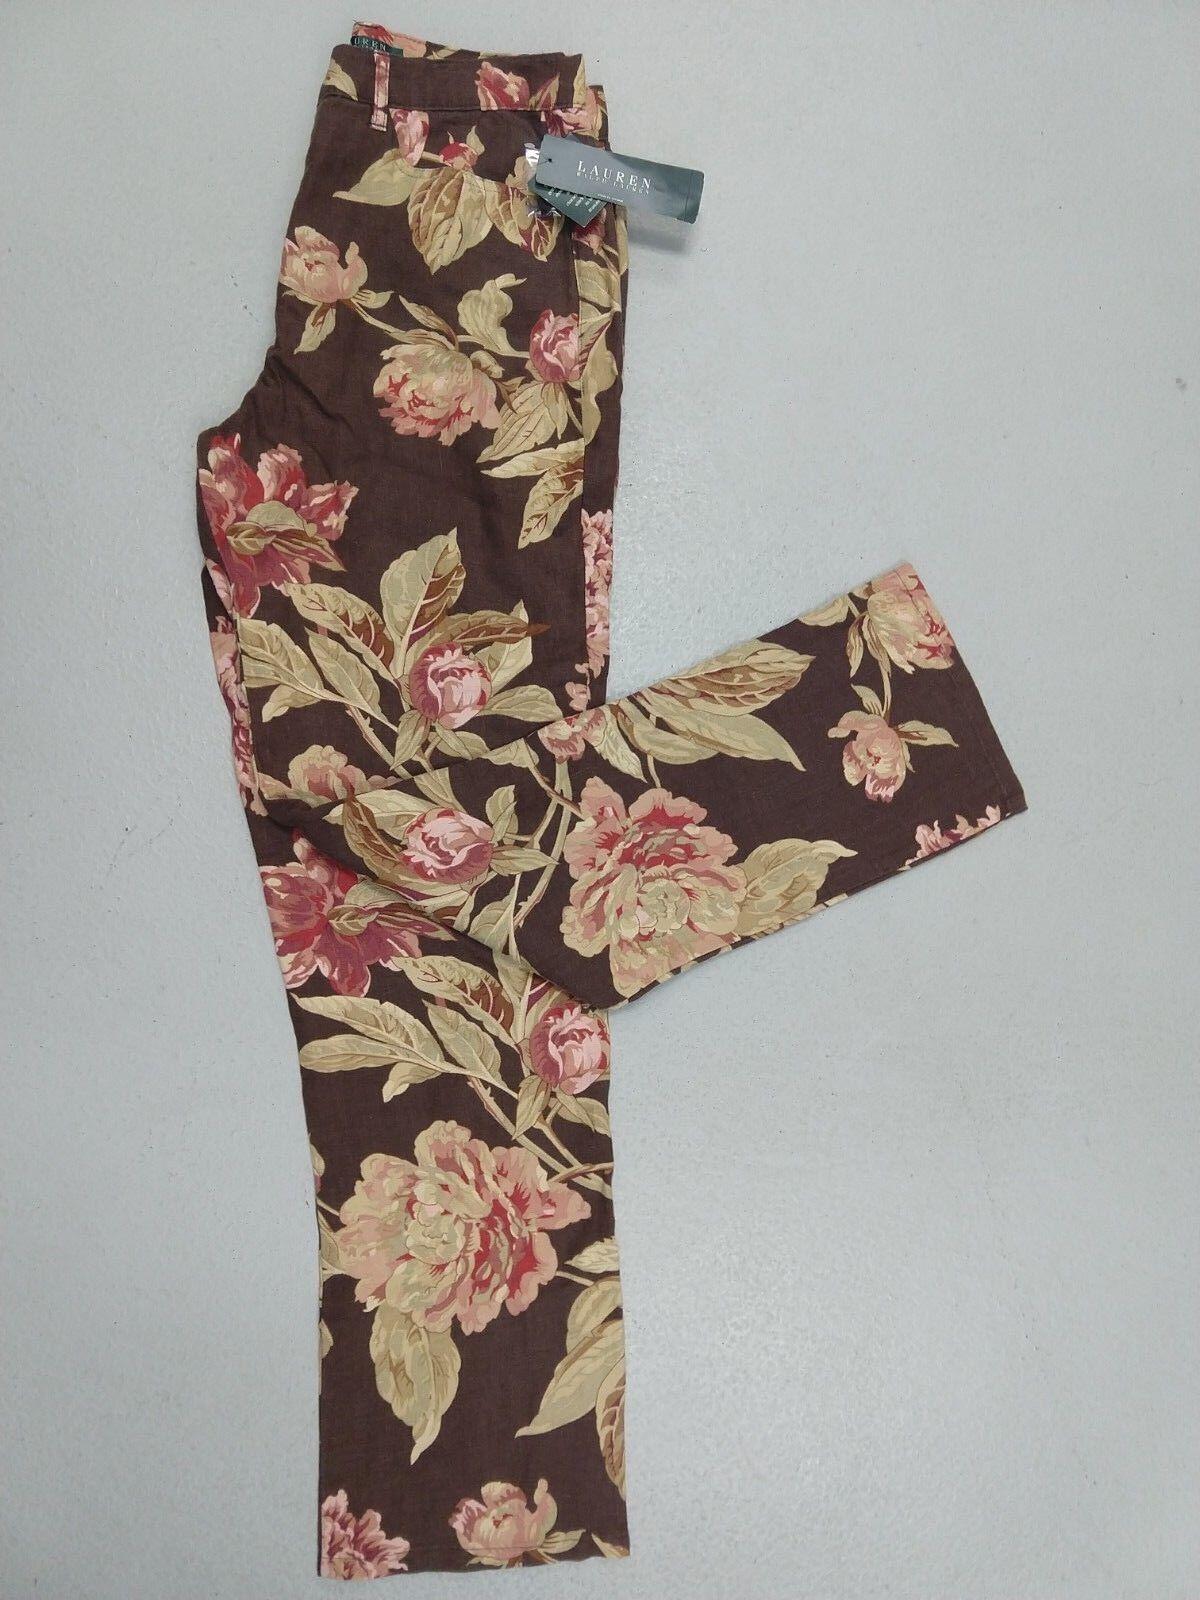 New Ralph Lauren Woman Floral Pants 10 Brown Linen cruise vacation clothes B